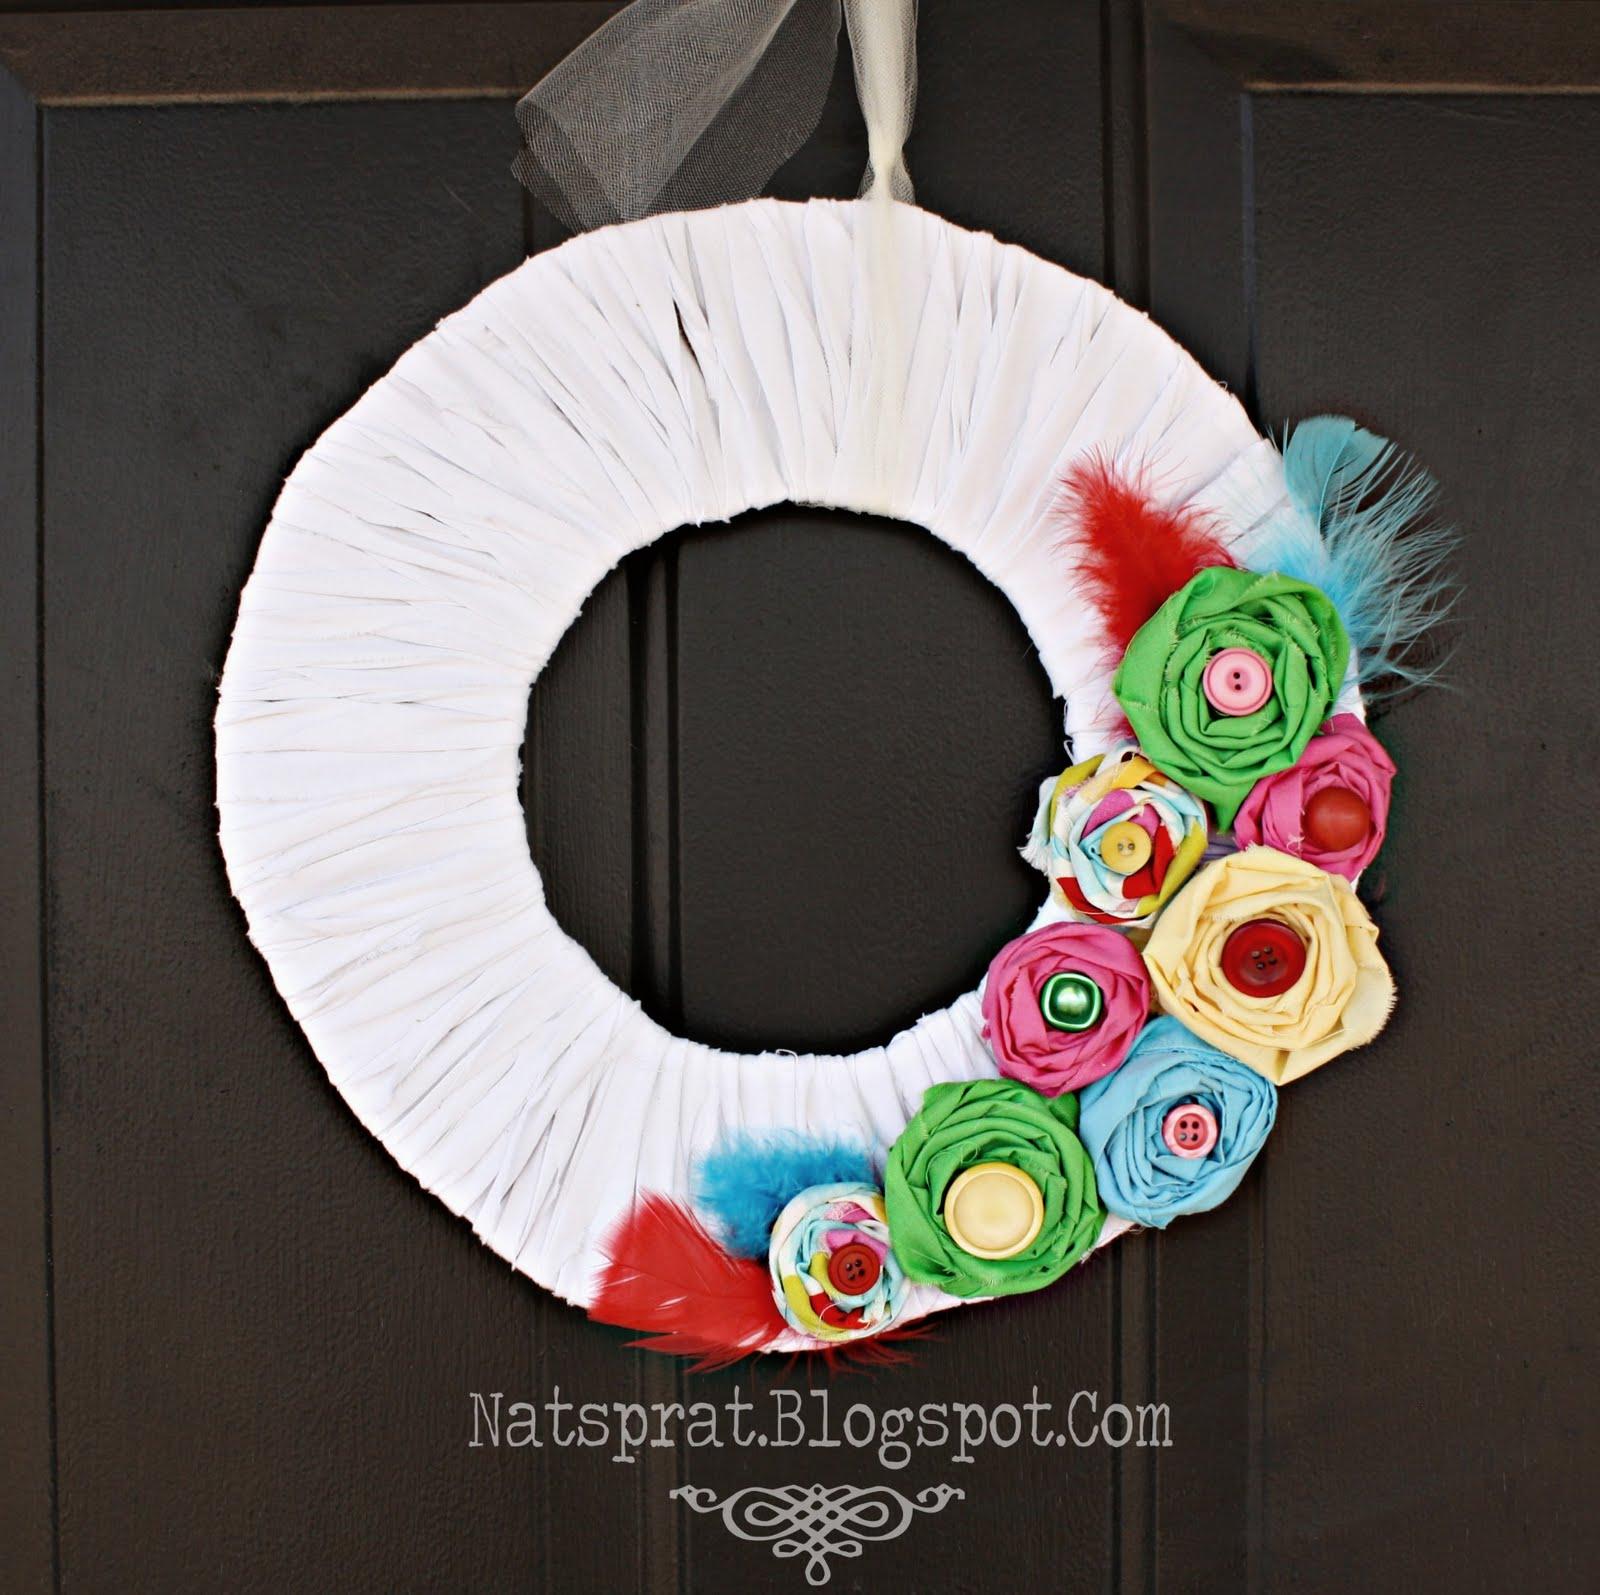 http://4.bp.blogspot.com/-AapMiQnoyKg/TYOf4gCsz9I/AAAAAAAABig/5EHyq7r1YUQ/s1600/wreath%2Bfinal%2B2.jpg